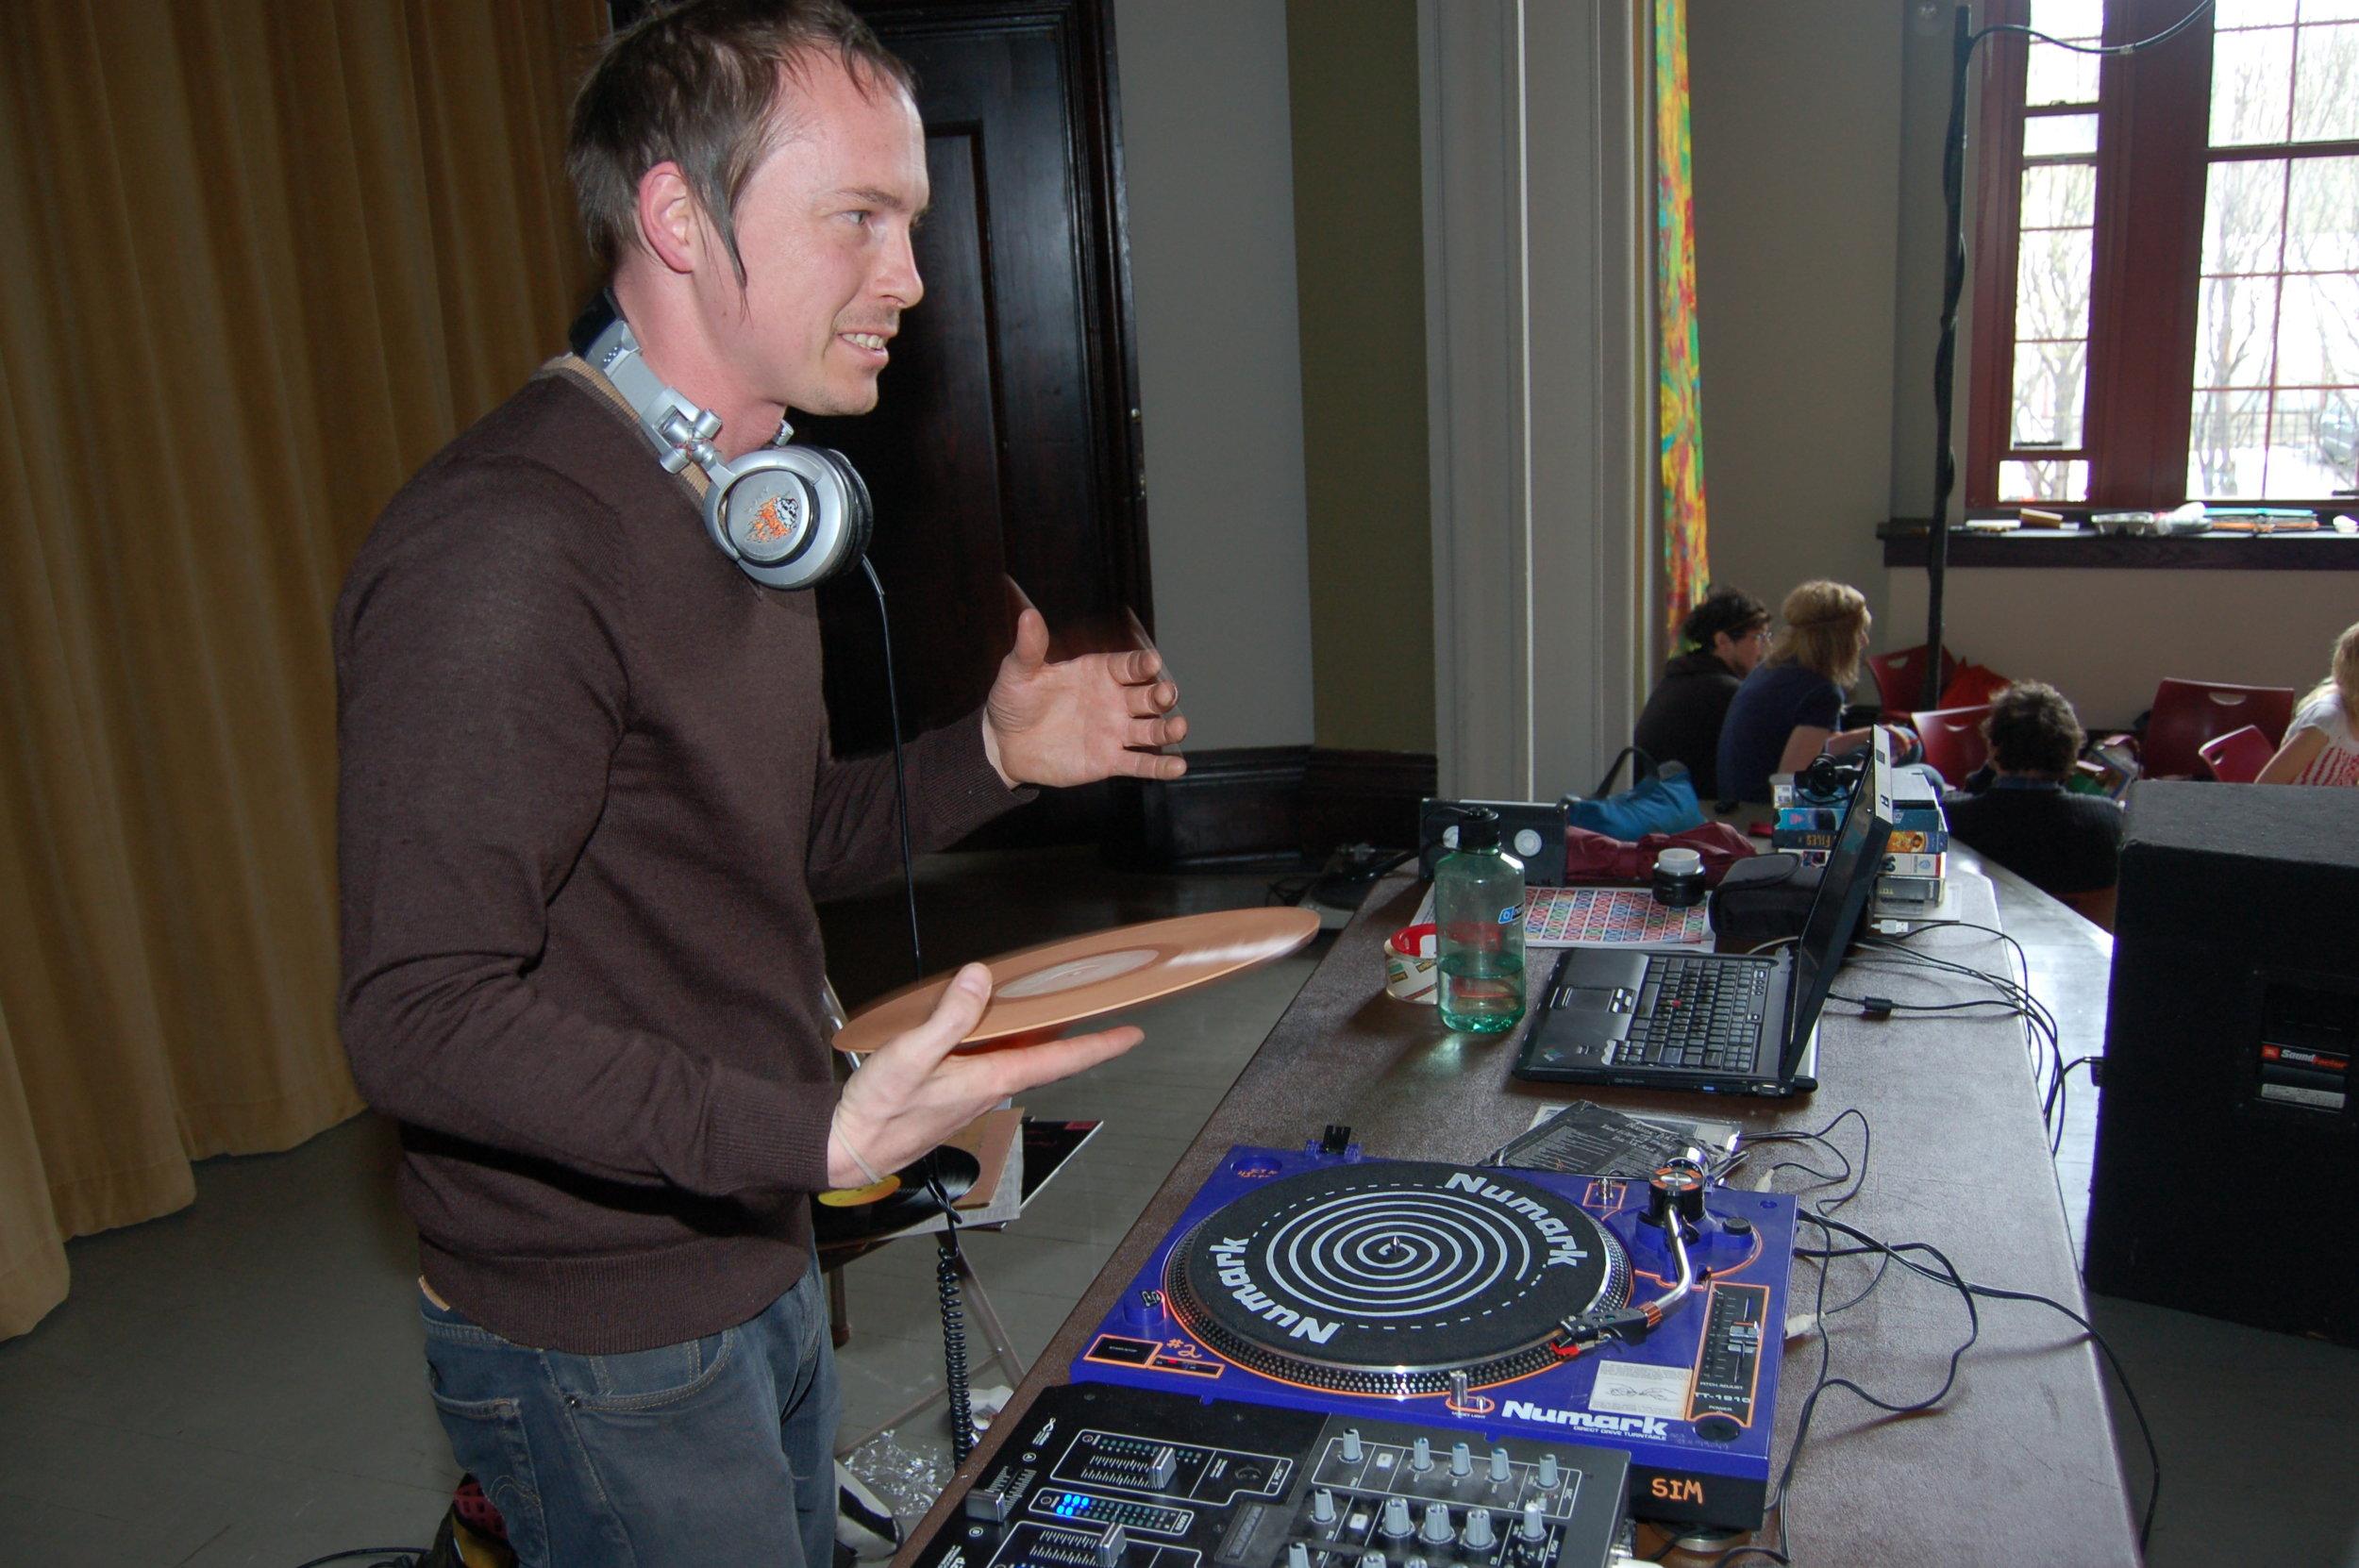 Above: Mark from Neptune on the DJ decks